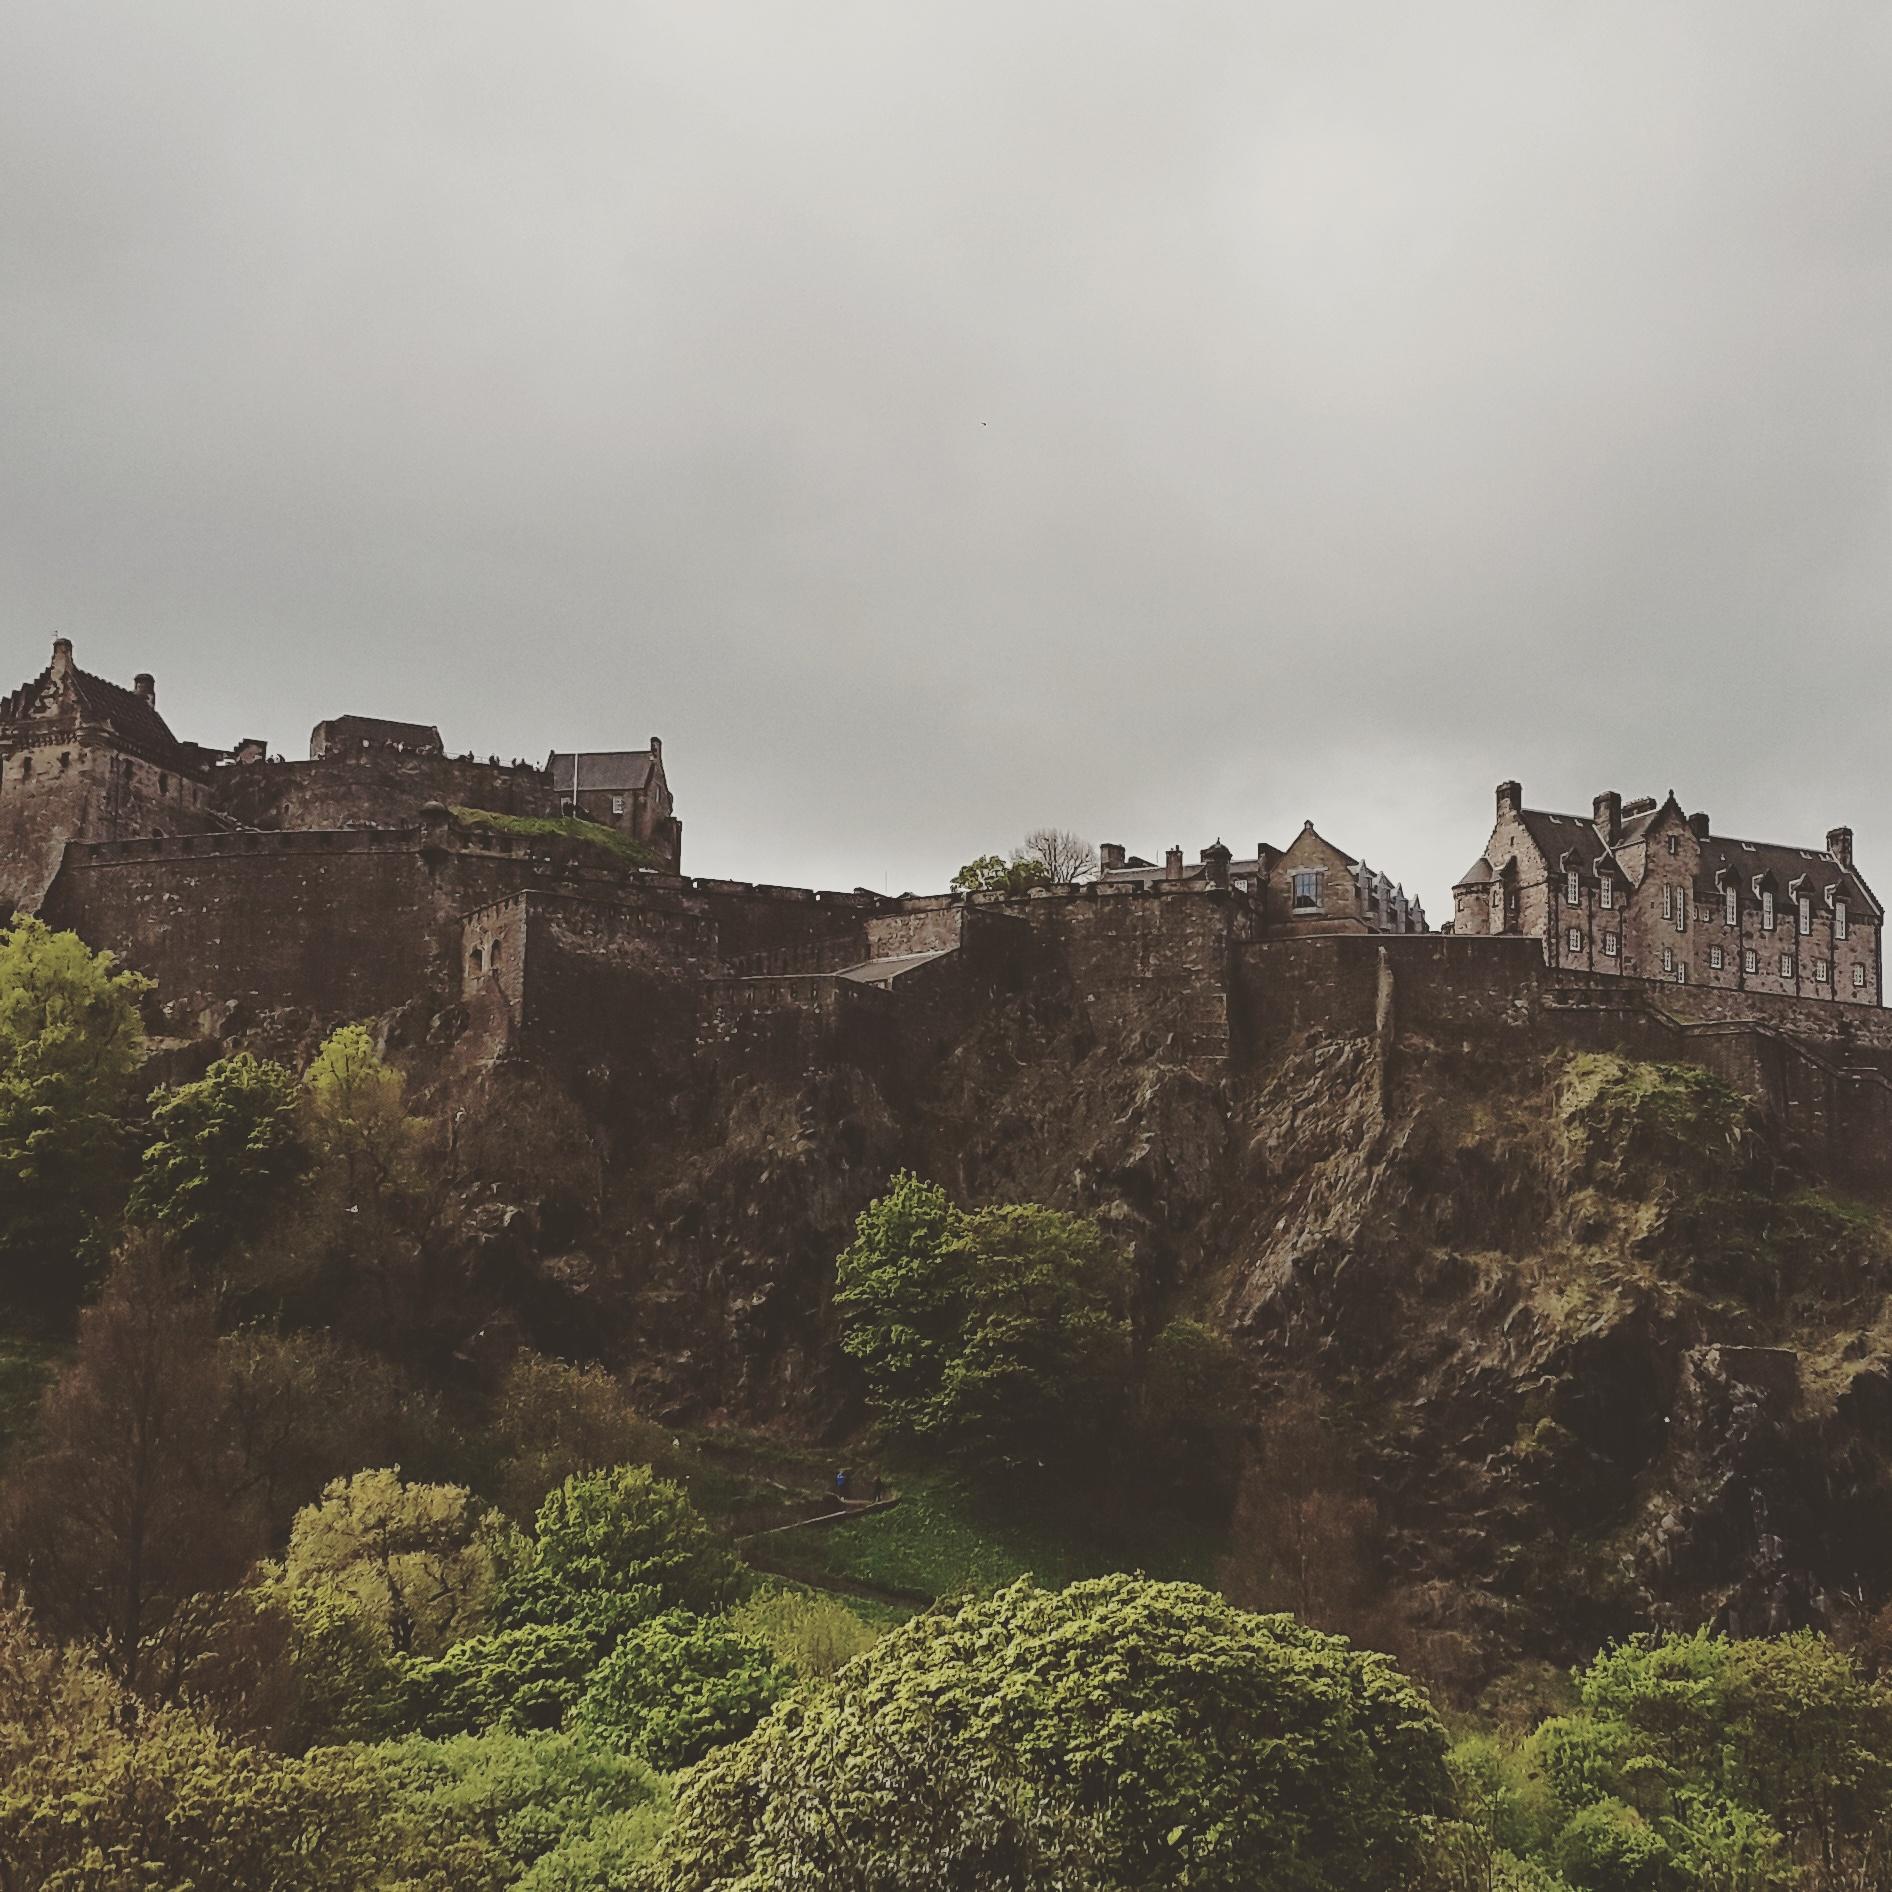 This castle!